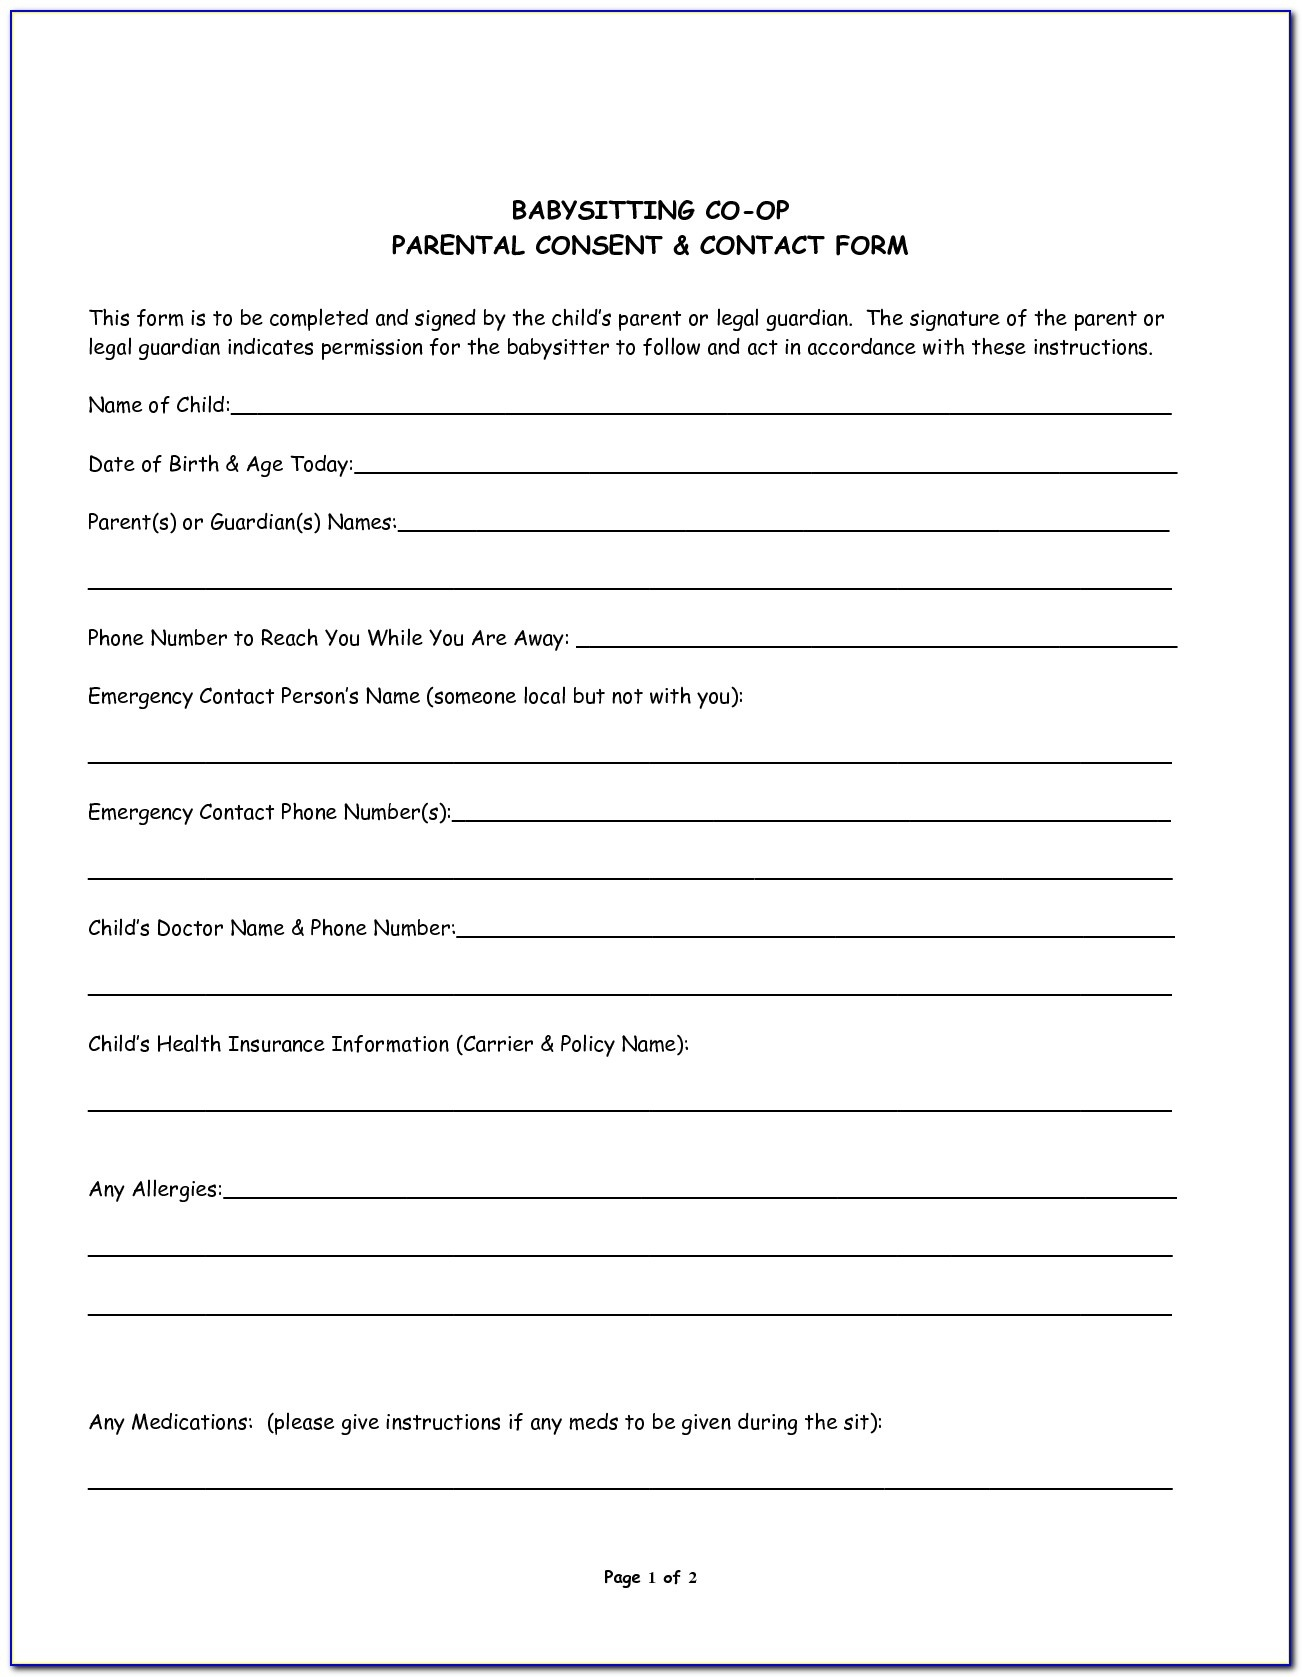 Medical Consent Form For Babysitter Printable - Form : Resume - Free Printable Child Medical Consent Form